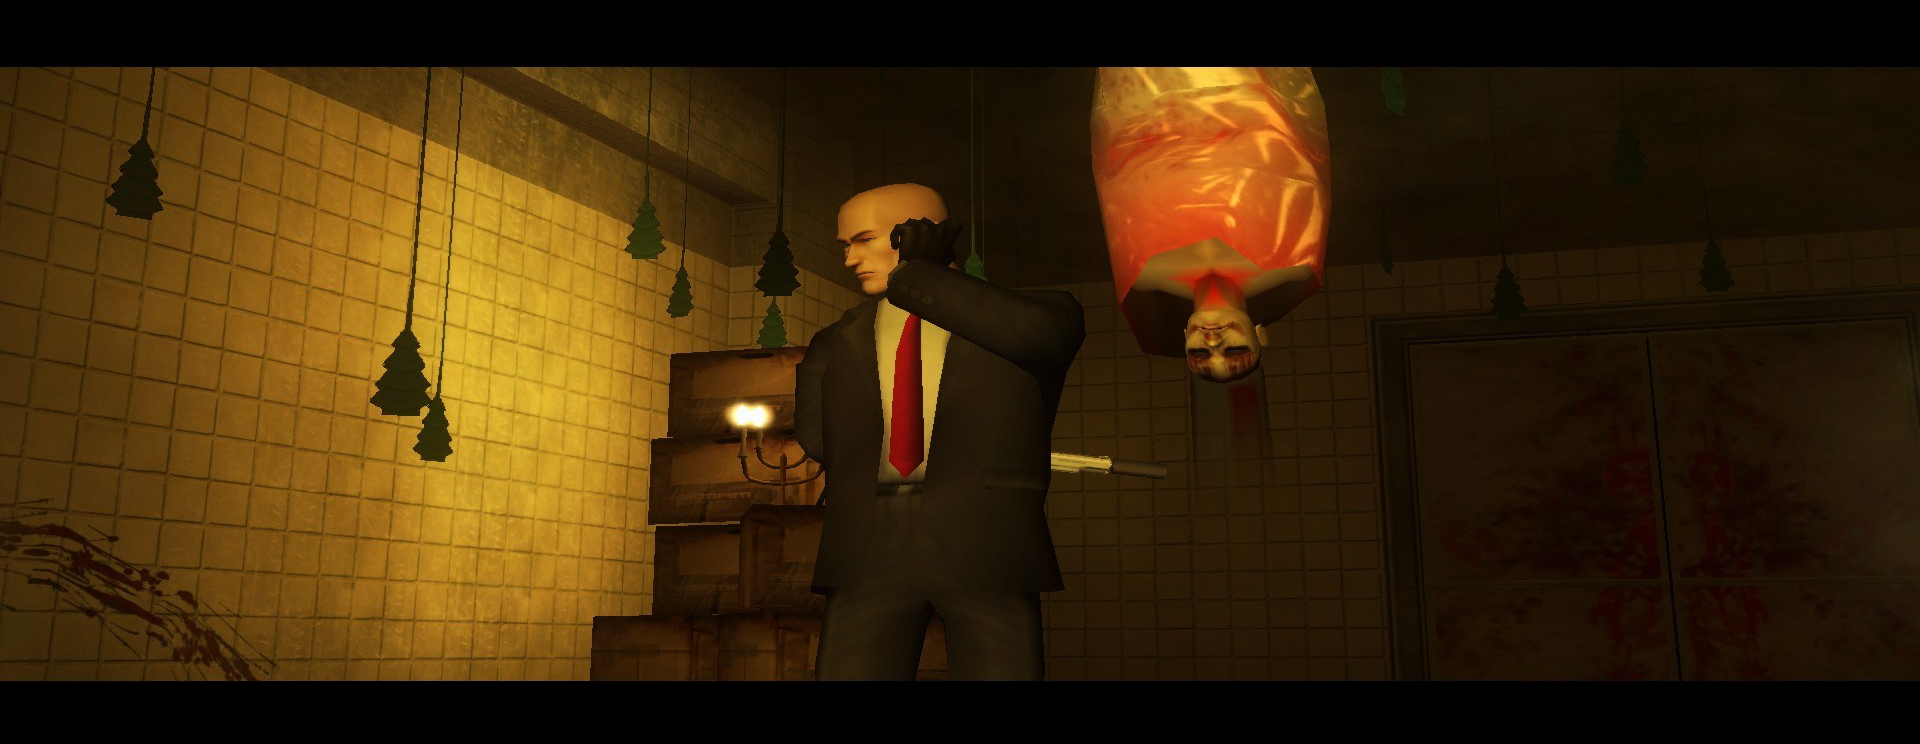 Hitman Contracts Horror Moments in Non-Horror Games 8Bit/Digi